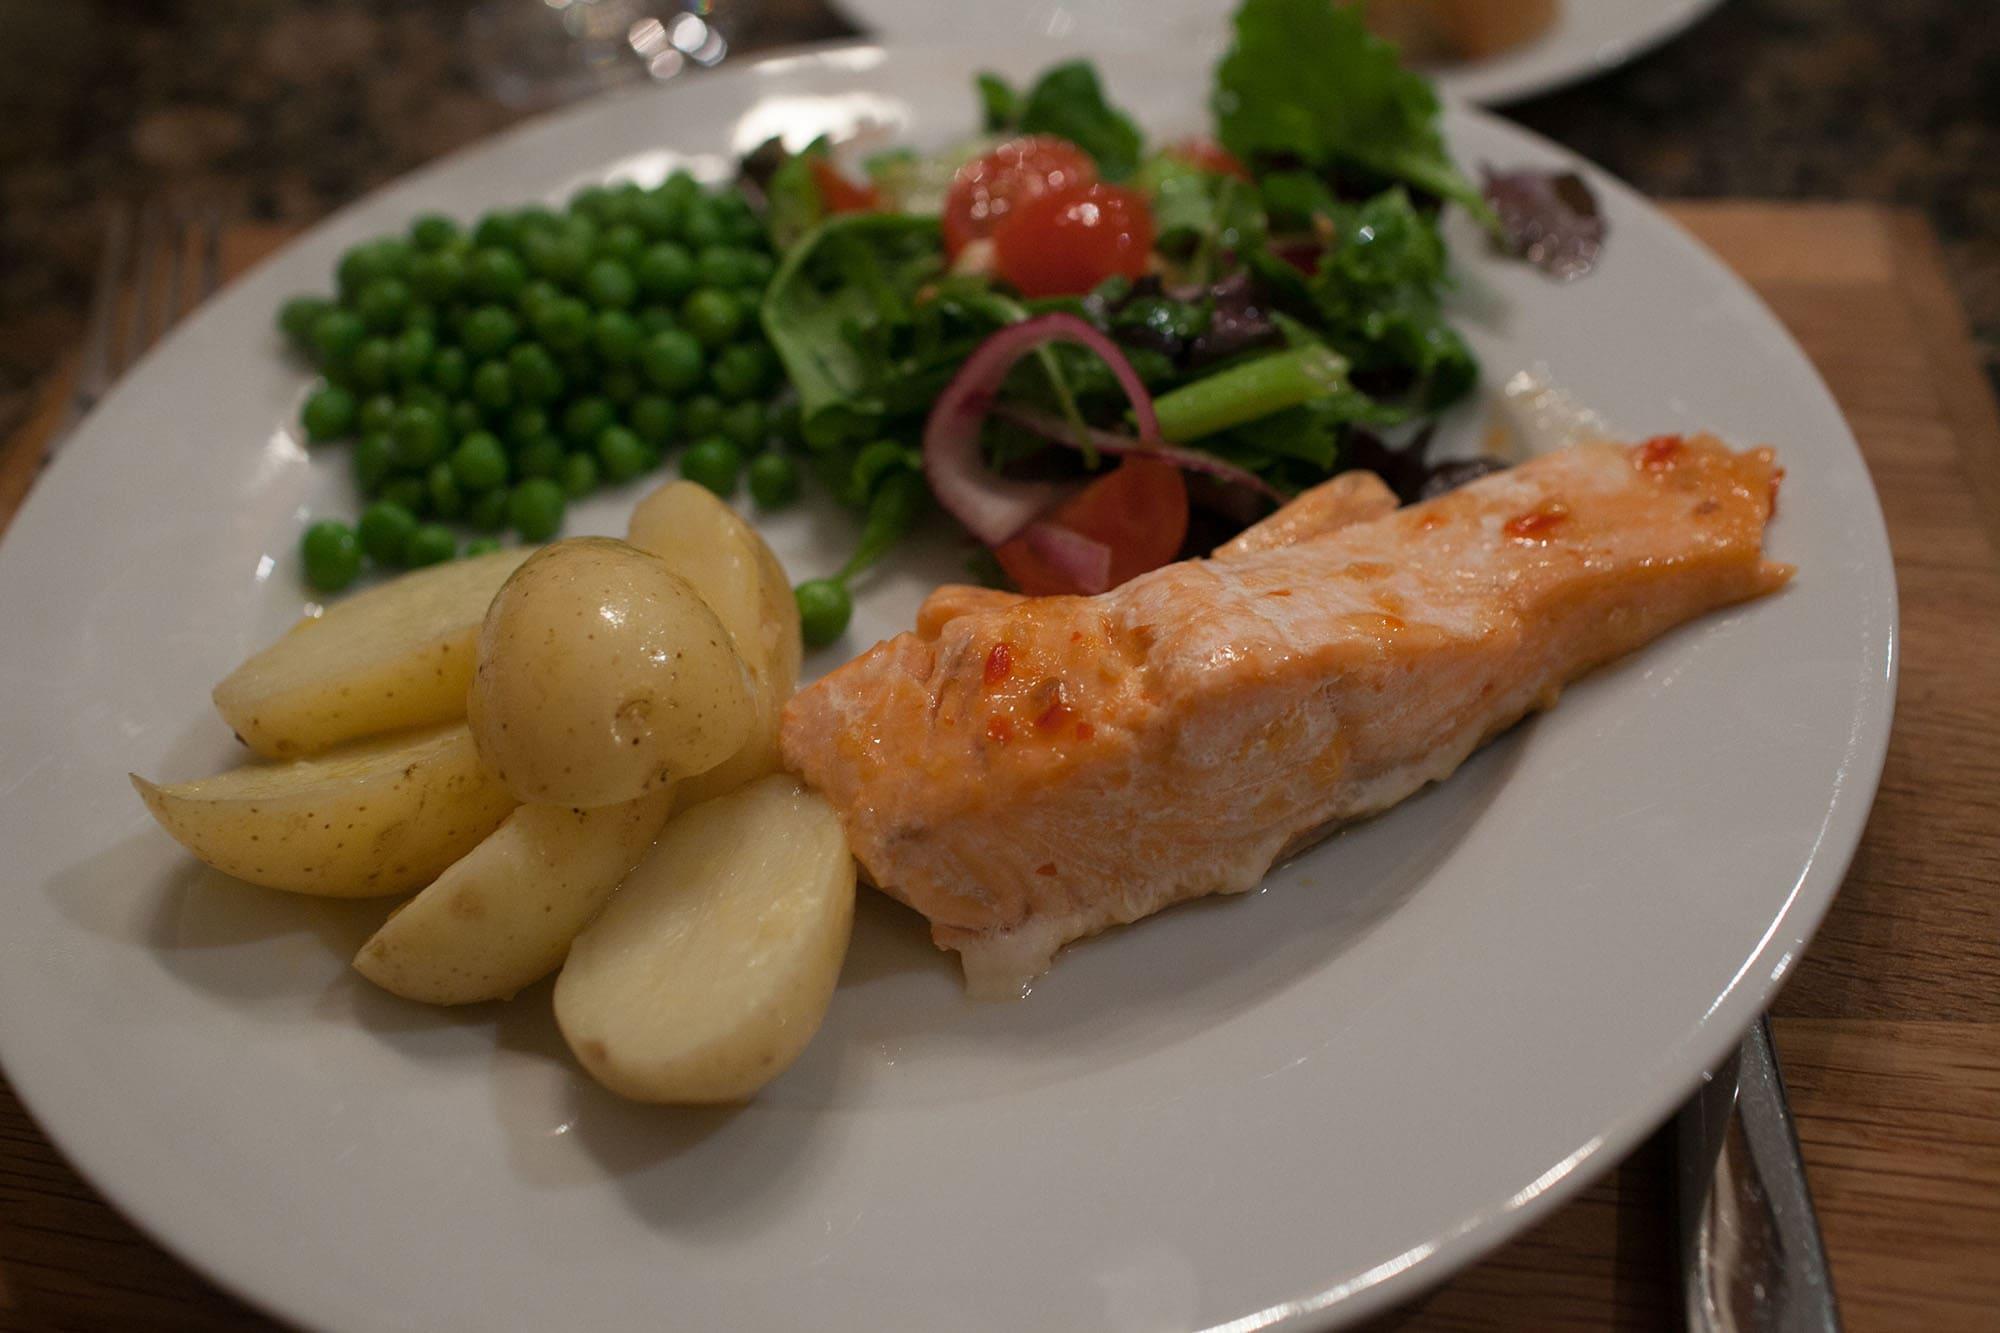 Salmon dinner made by Tom's mom.